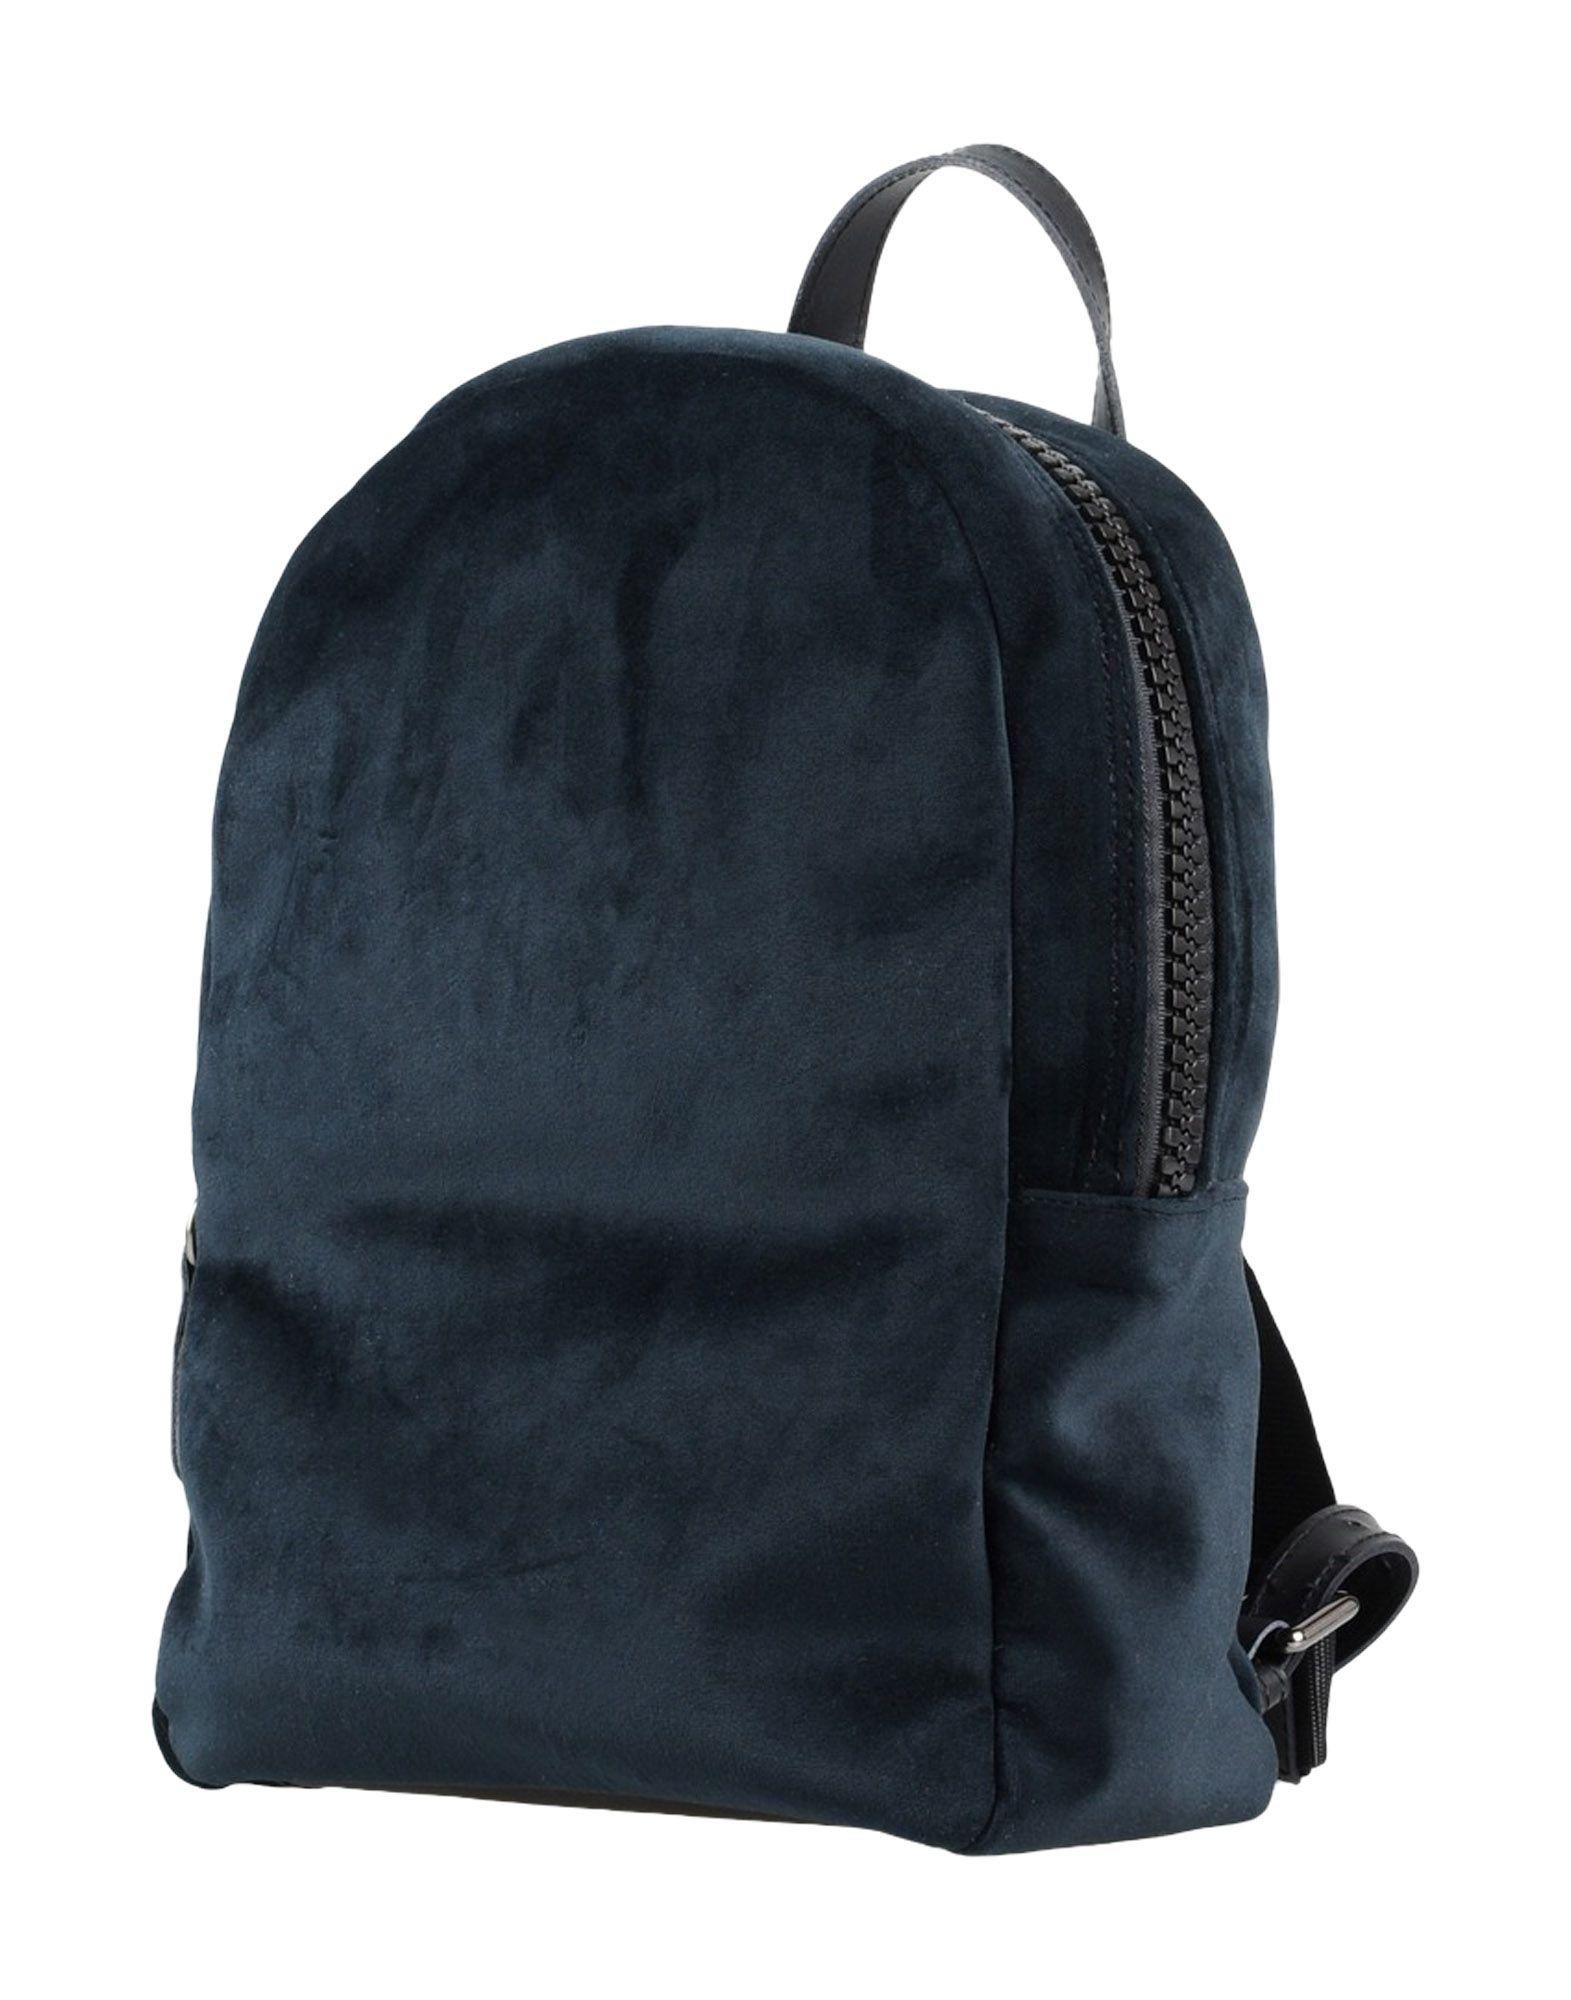 WHITE IN 8 Рюкзаки и сумки на пояс рюкзаки кенгуру foppapedretti marsupi 8